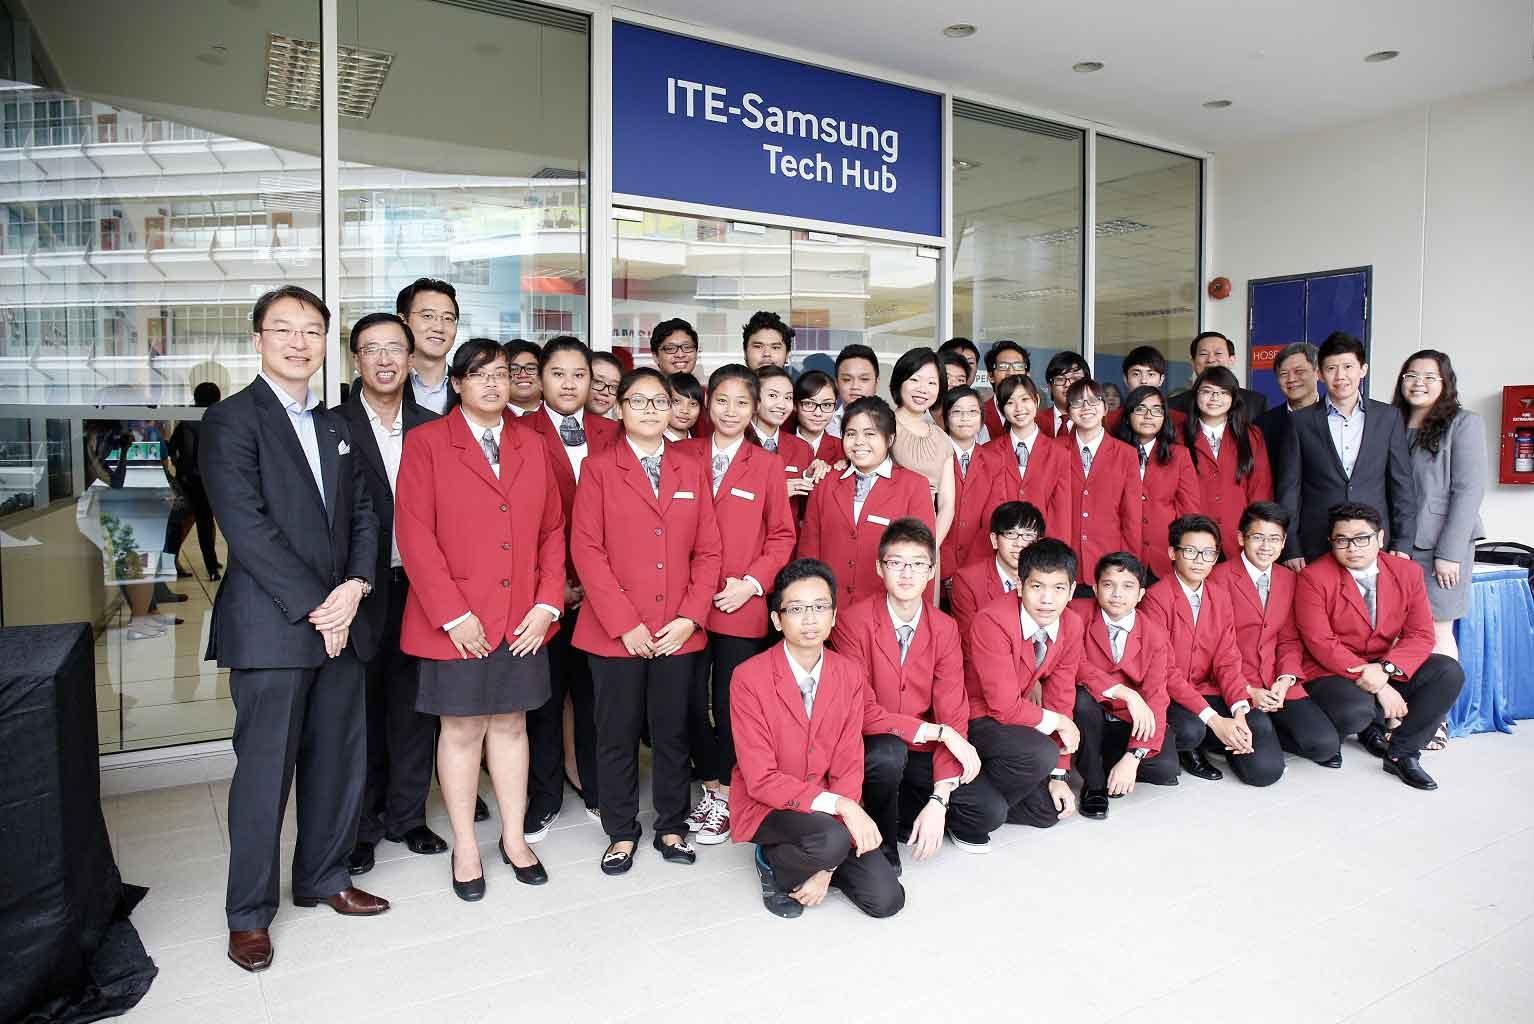 TE-SAMSUNG TECH HUB: PREPARING YOUTH FOR THE WORKFORCE